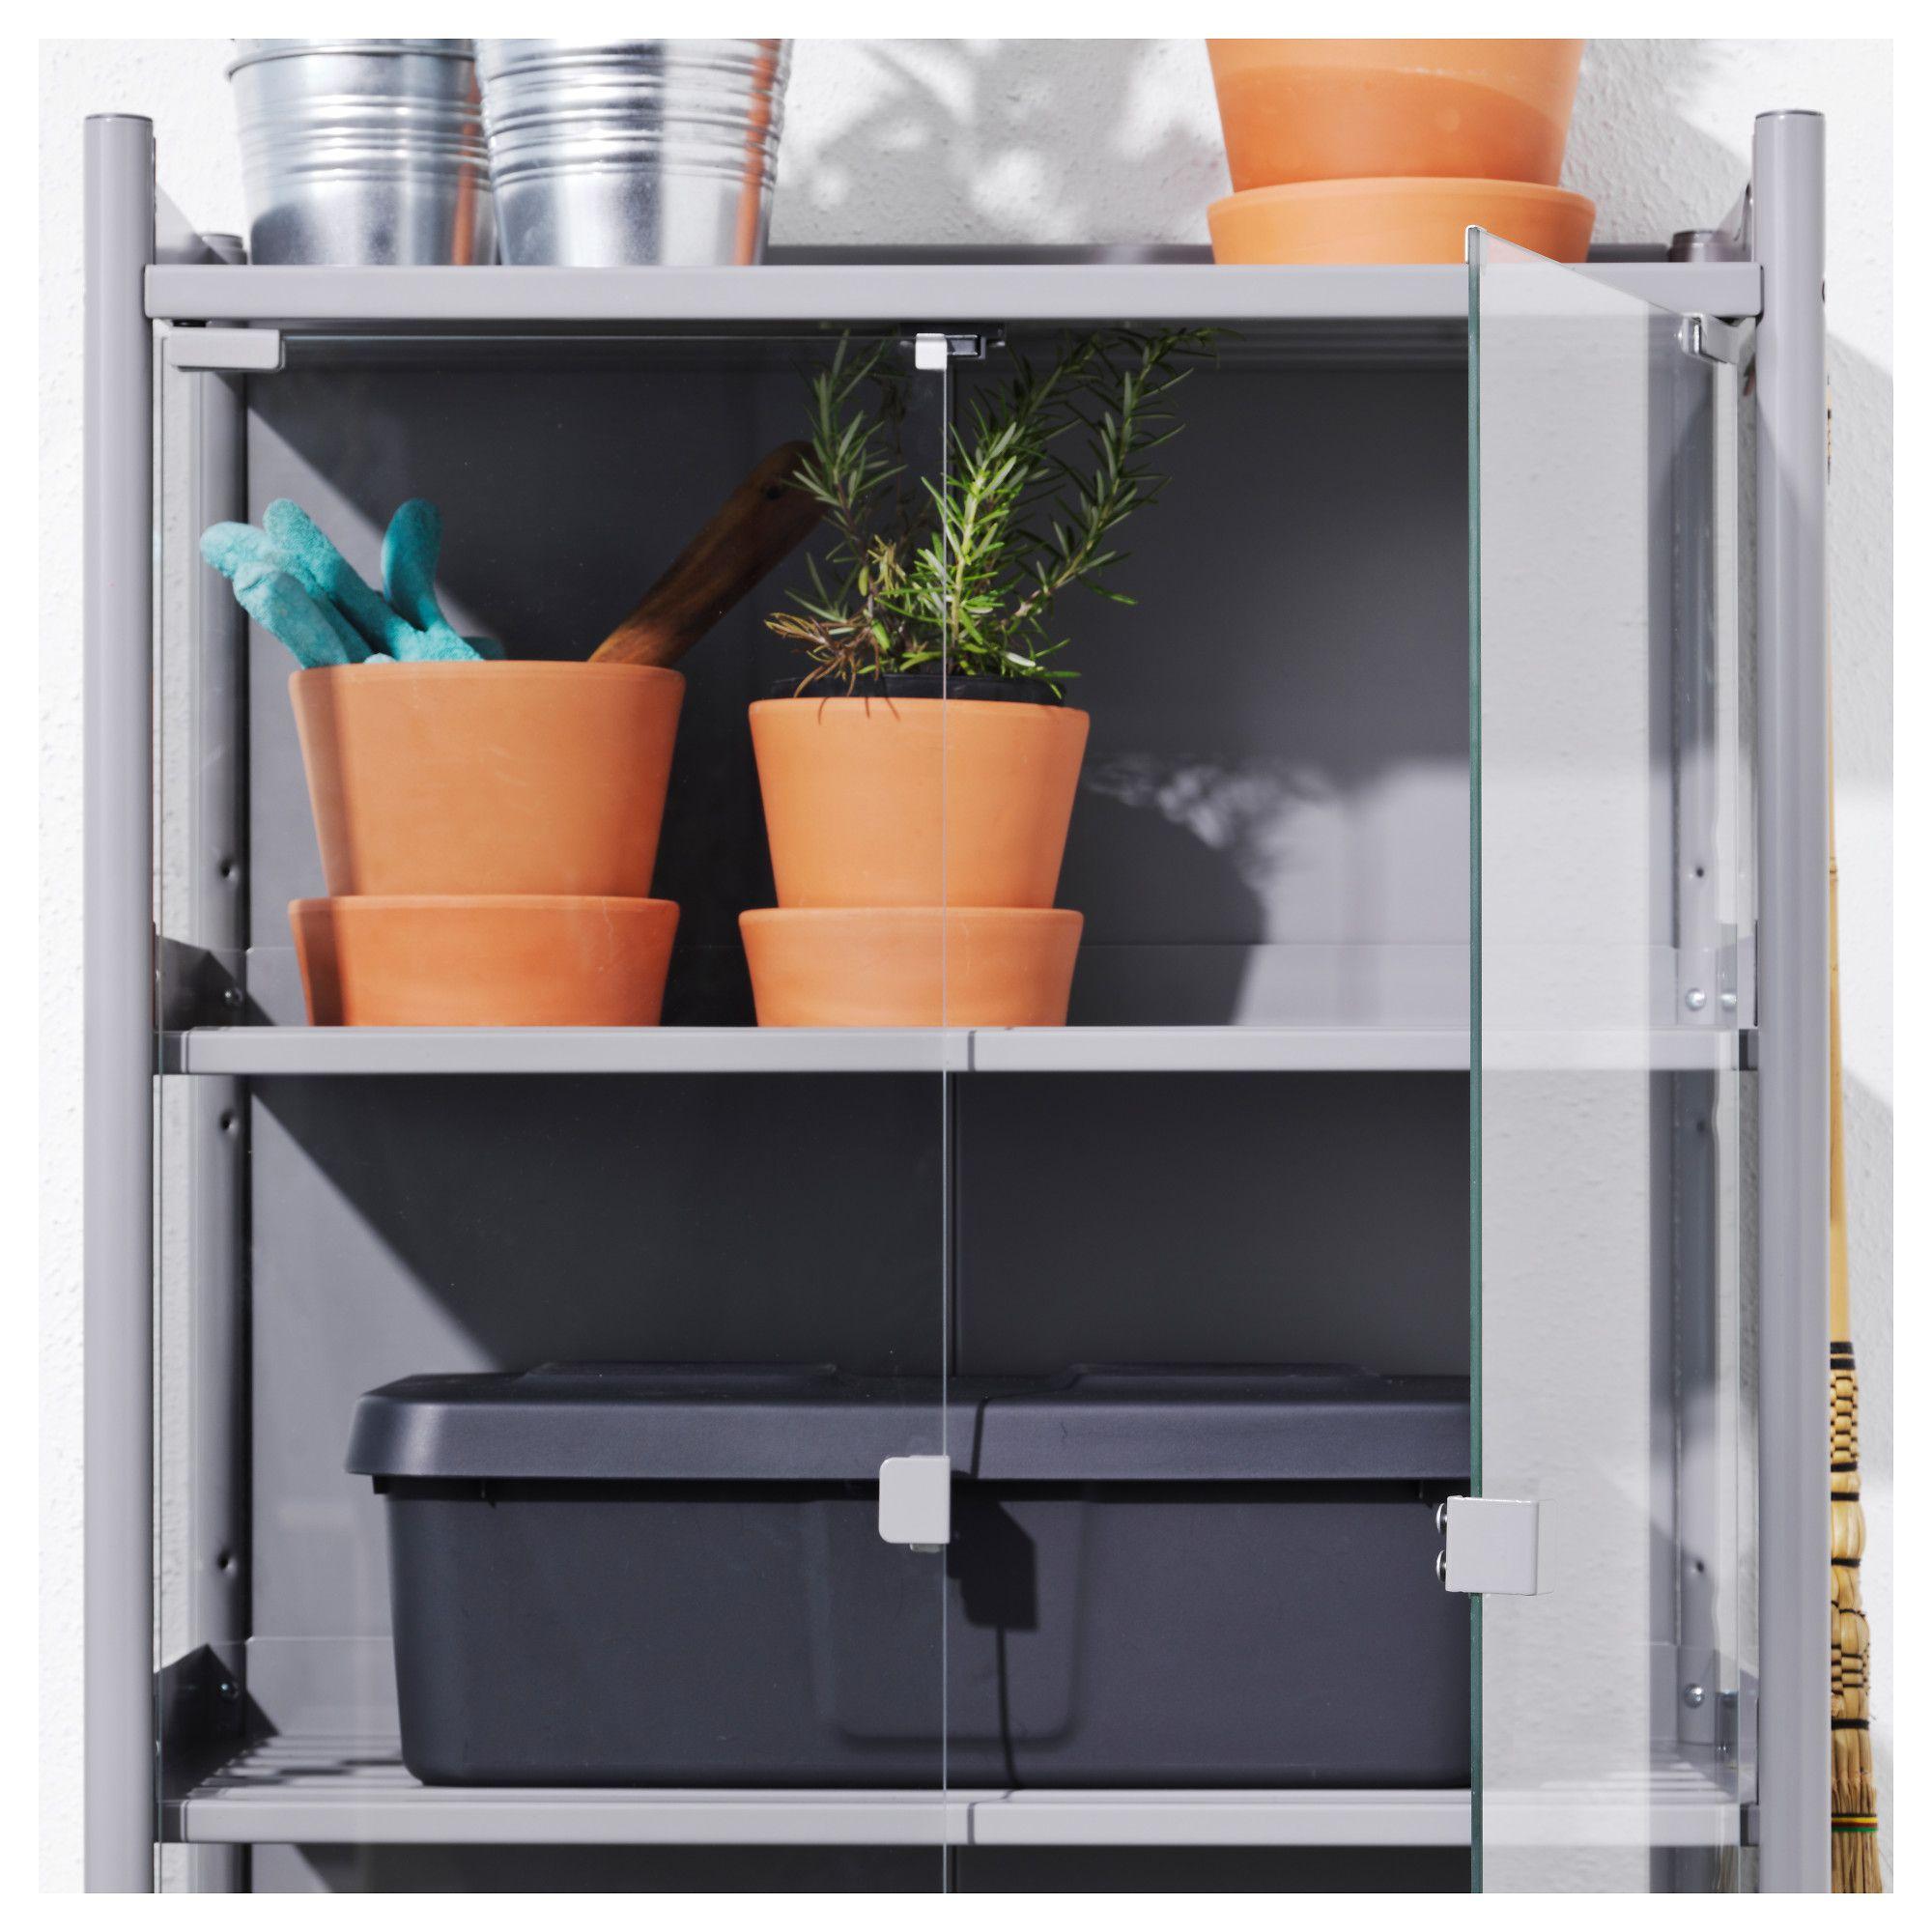 Furniture And Home Furnishings Drinnen Schrank Und Ikea